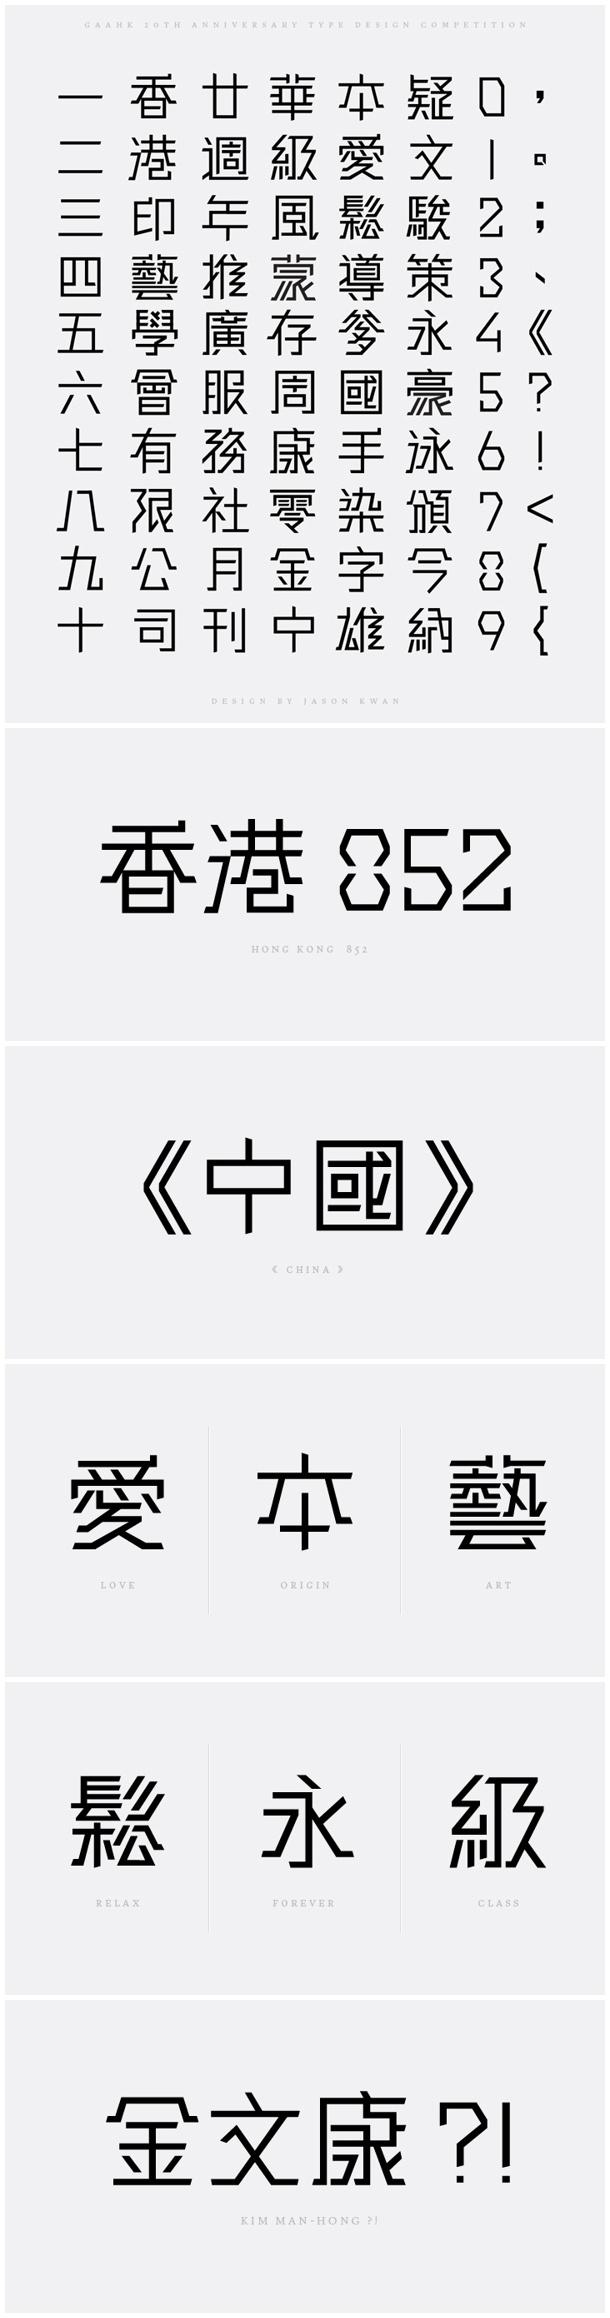 GAAHK Typeface Design via http://www.behance.net/gallery/GAAHK-Typeface-Design/8064639